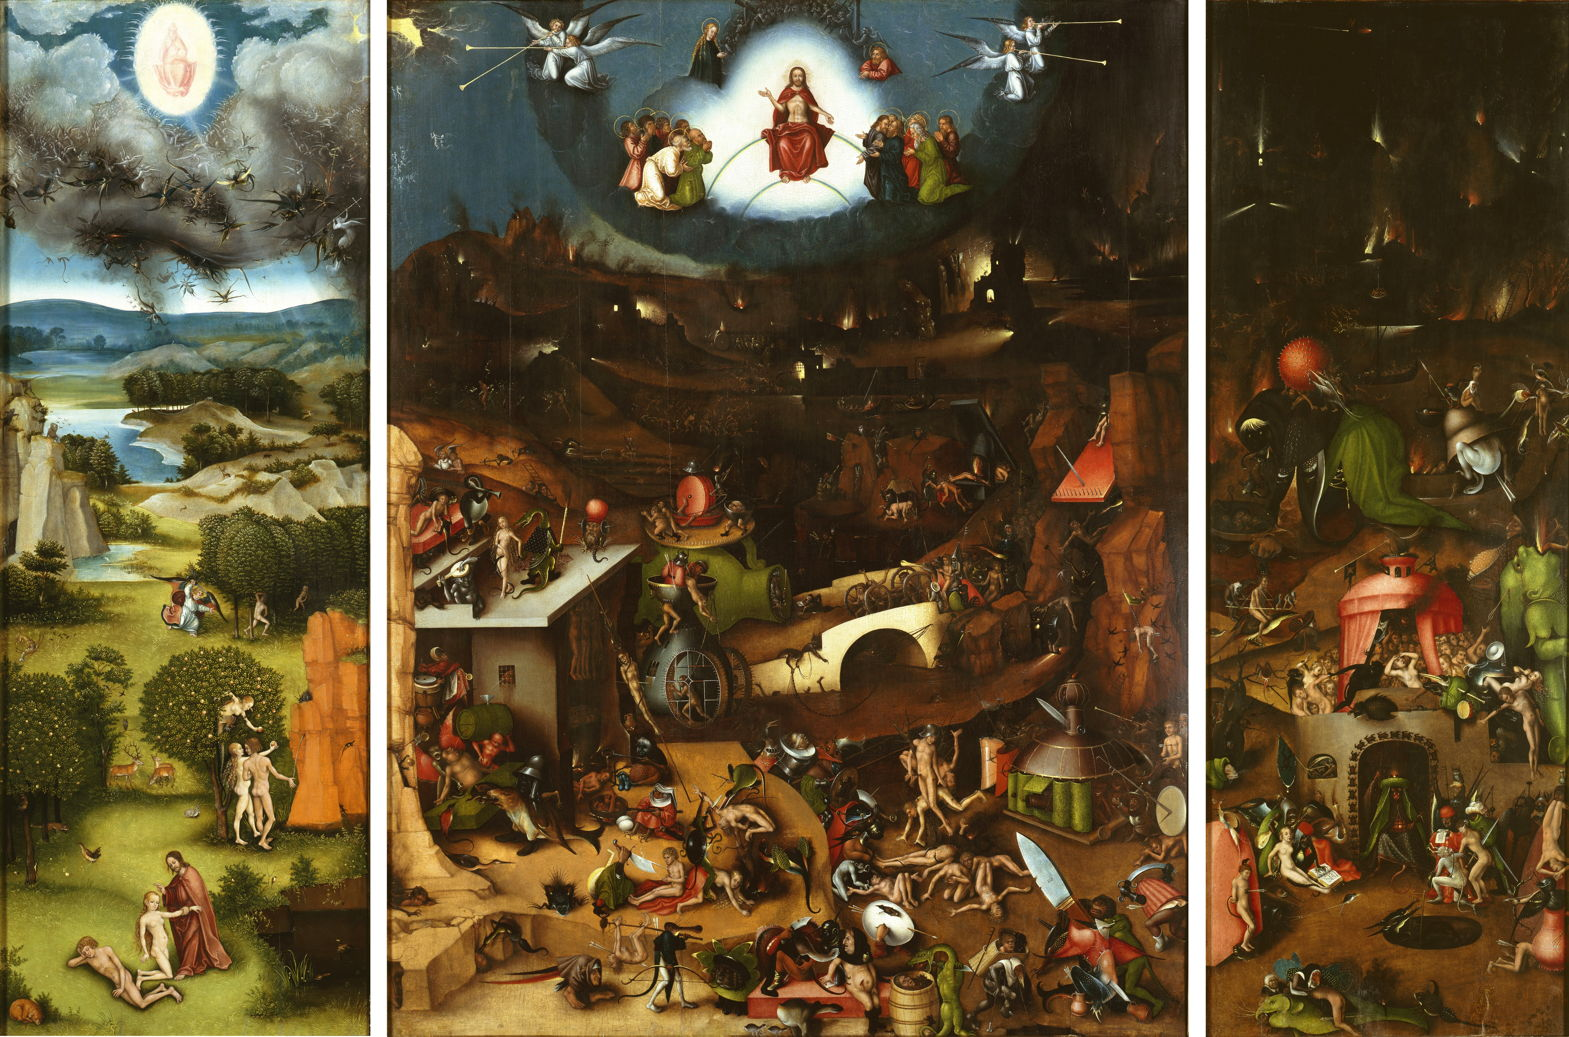 The Last Judgement, School of Lucas Cranach 1519